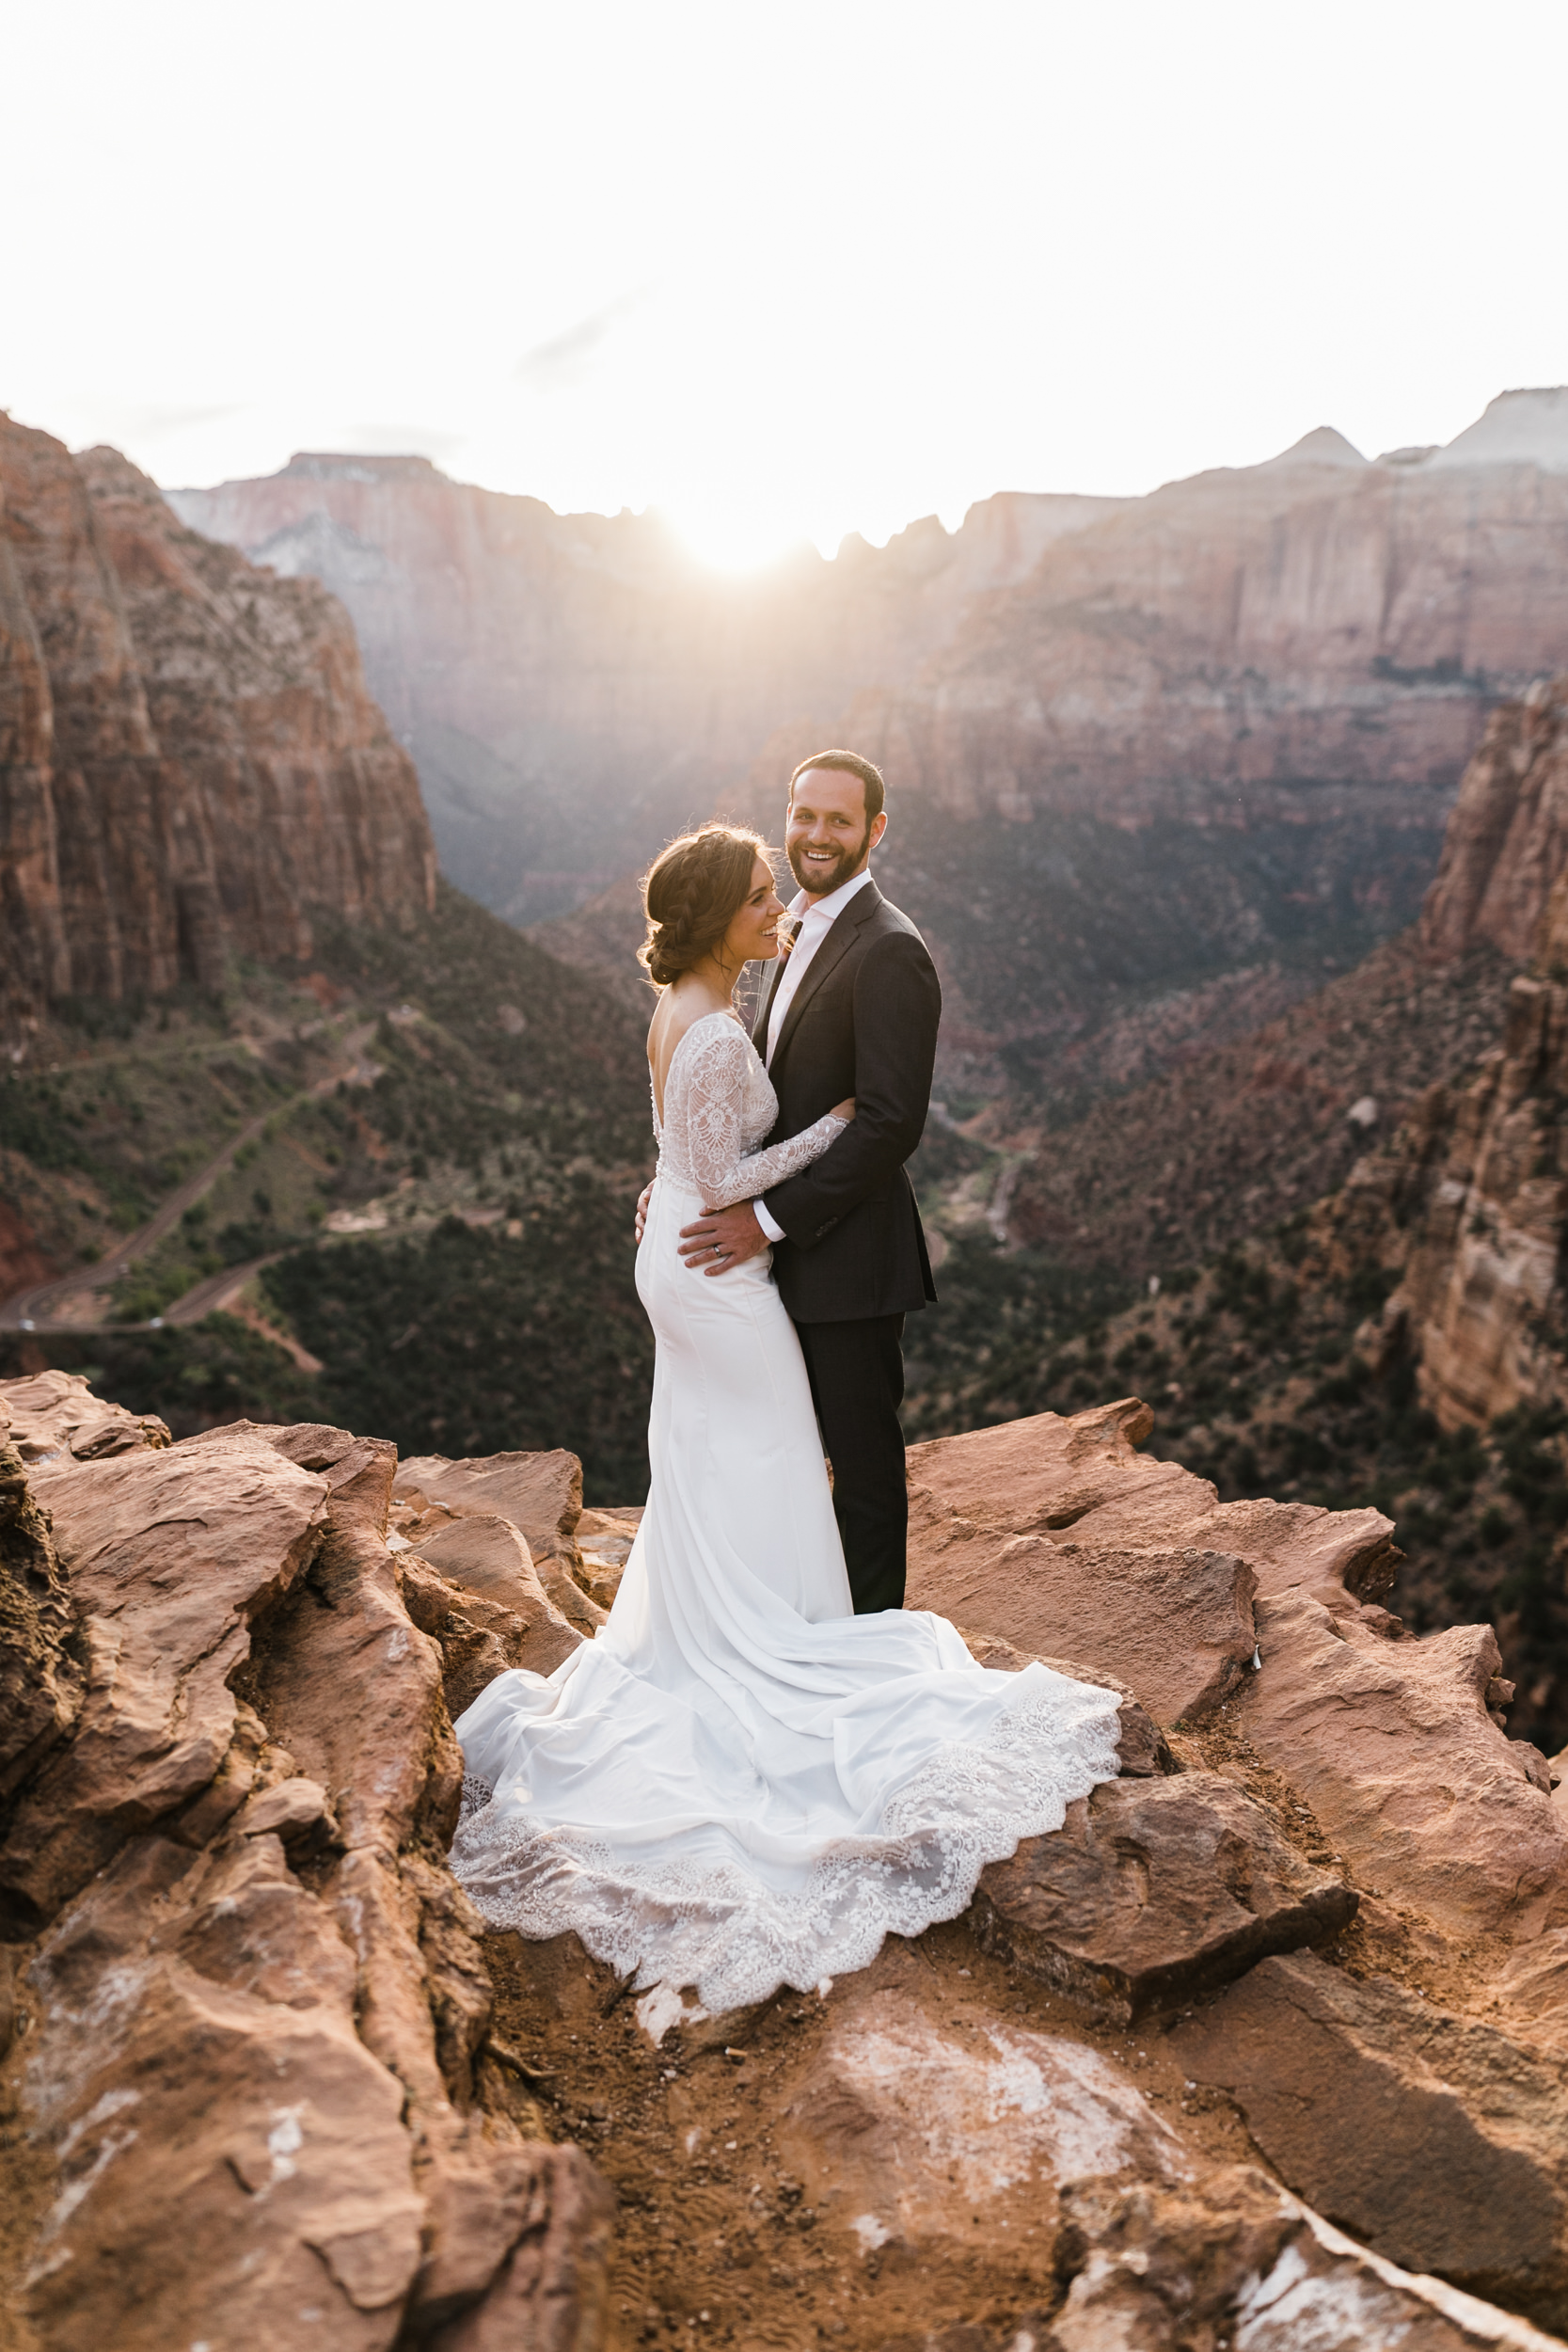 Zion-National-Park-Adventure-Wedding-Hearnes-Elopement-Photography-49.jpg